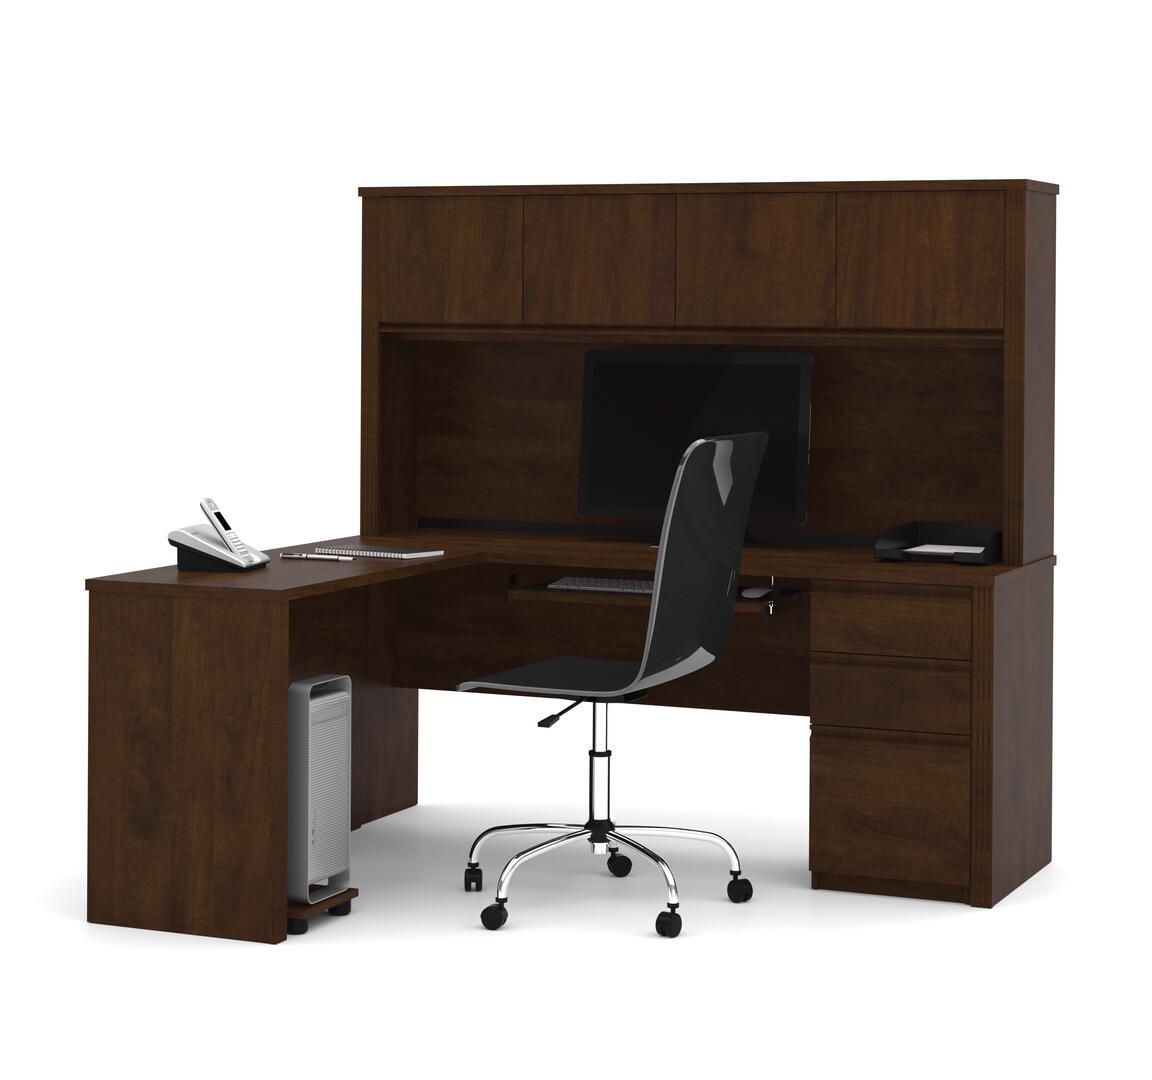 Bestar furniture 9987269 modern l shape office desk for Furniture 5 years no interest